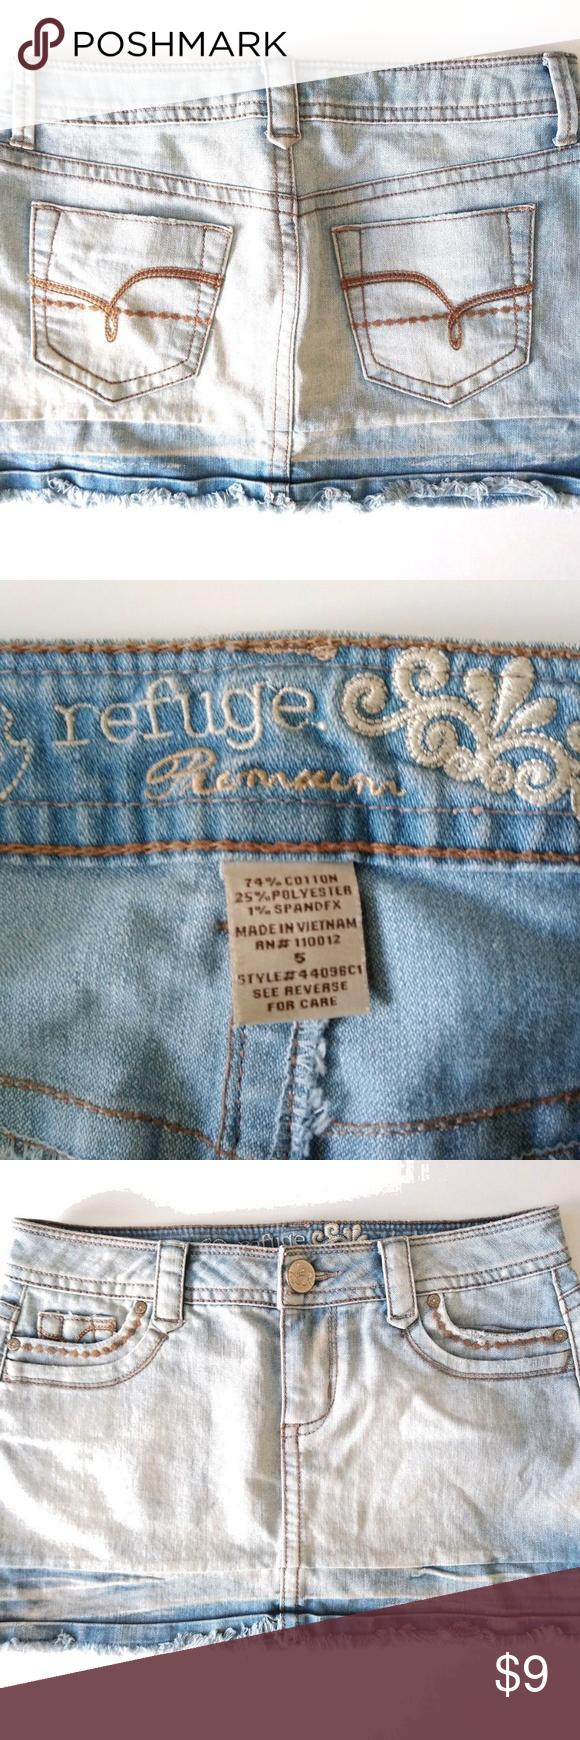 00c3350a4 Refuge Premium Women's Denim Blue Jean Mini Skirt Refuge Premium Denim Blue  Jean Skirt Women's Size